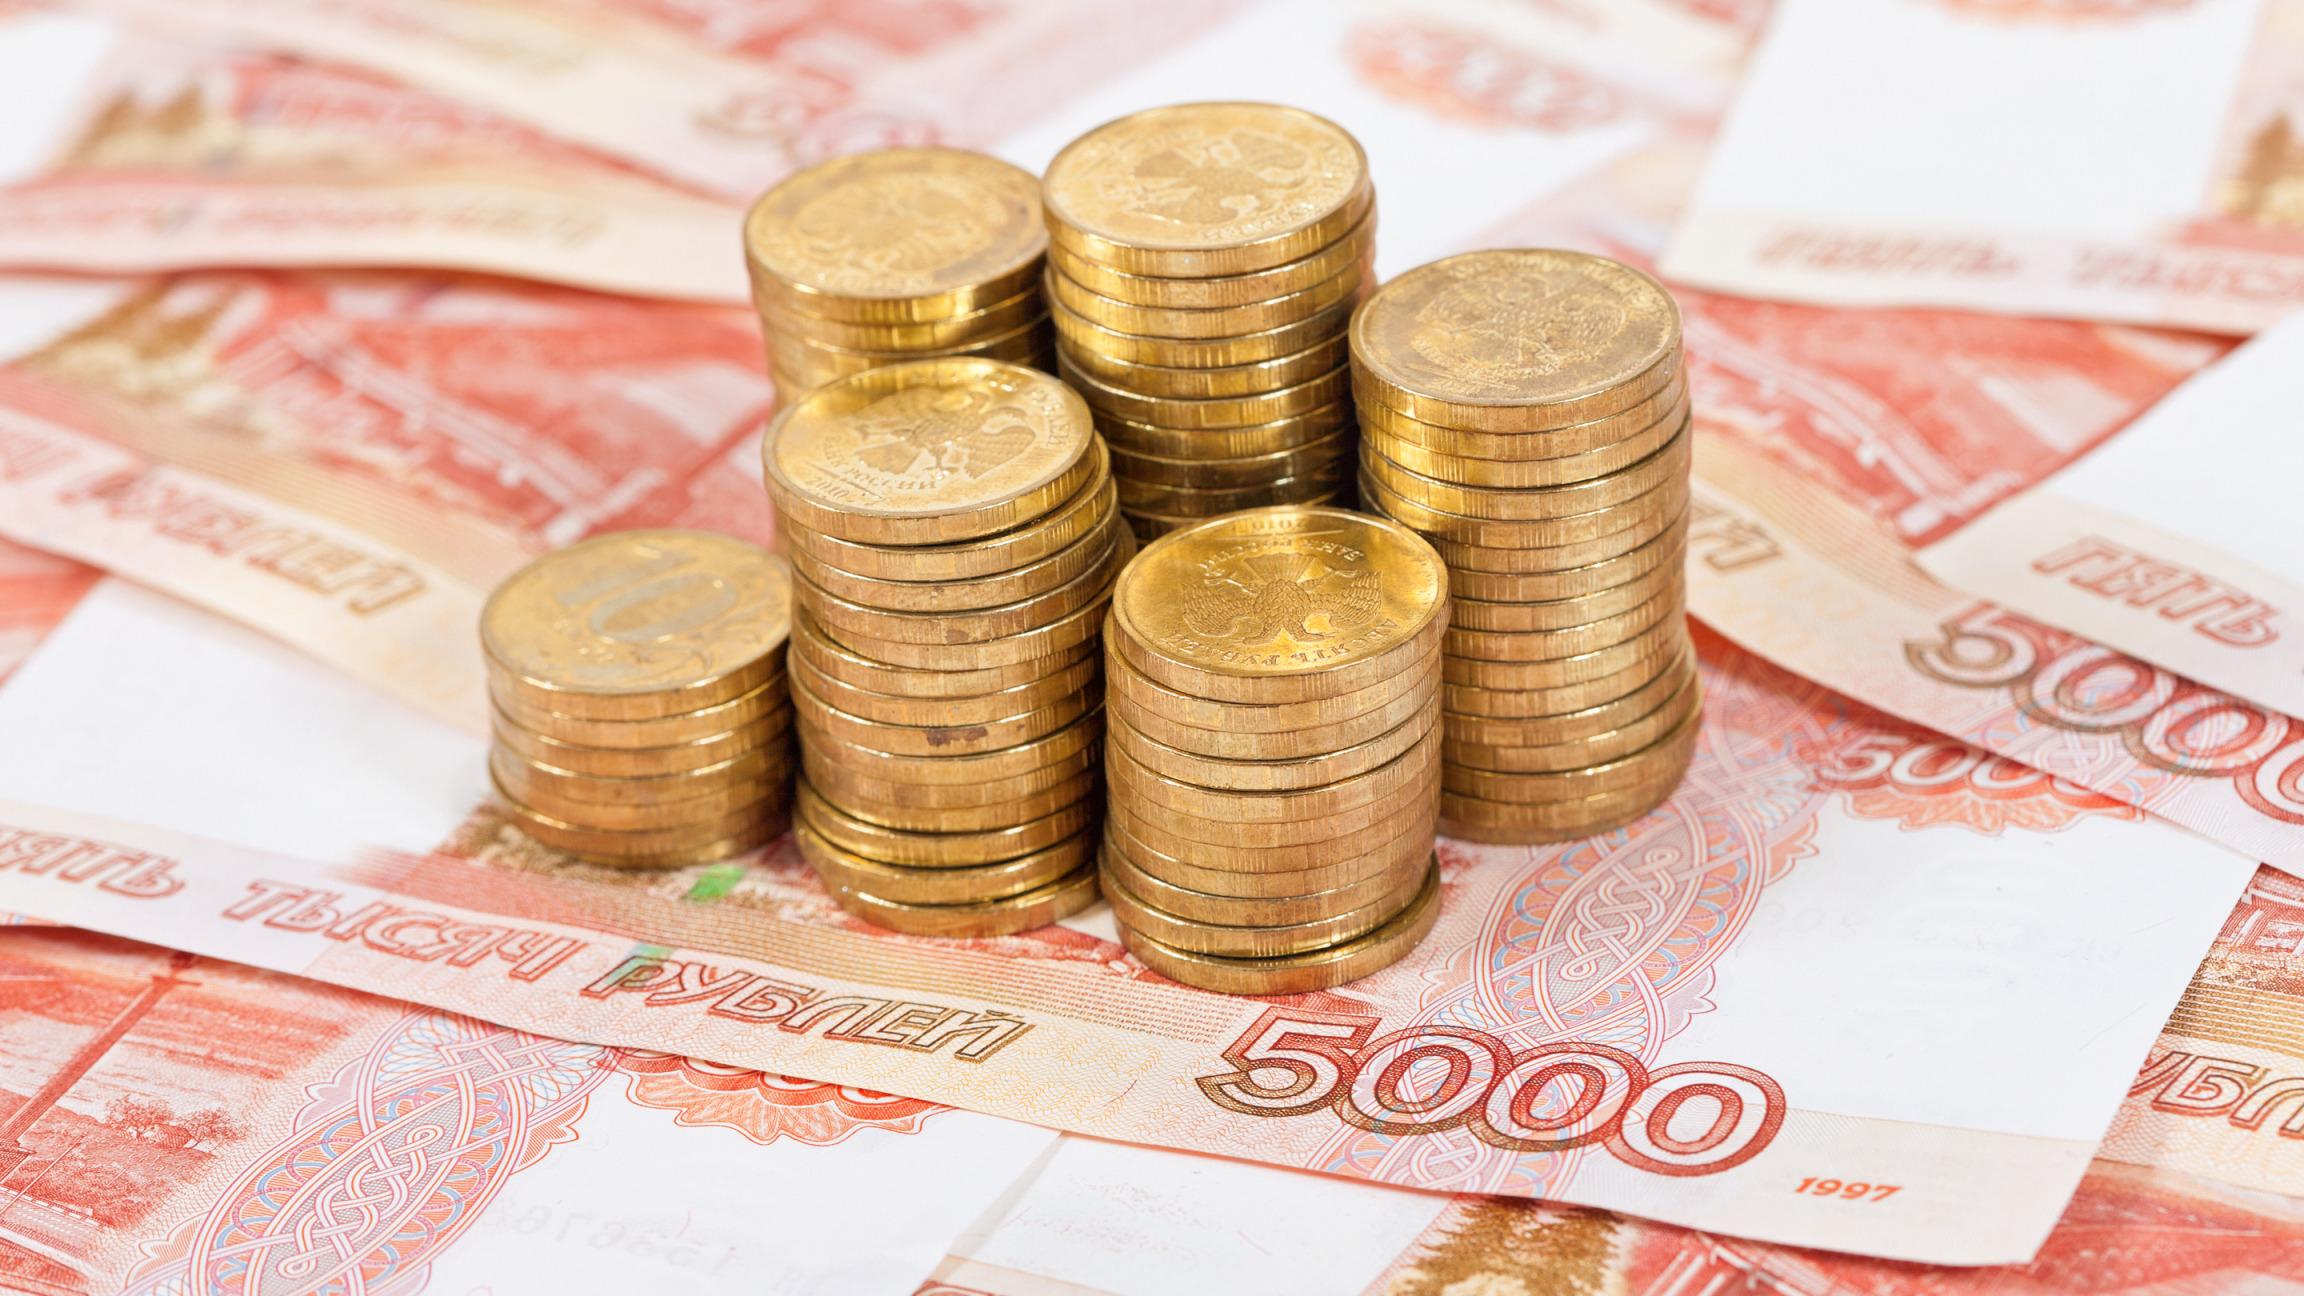 https://img1.goodfon.ru/original/2304x1296/4/34/background-cash-coins.jpg